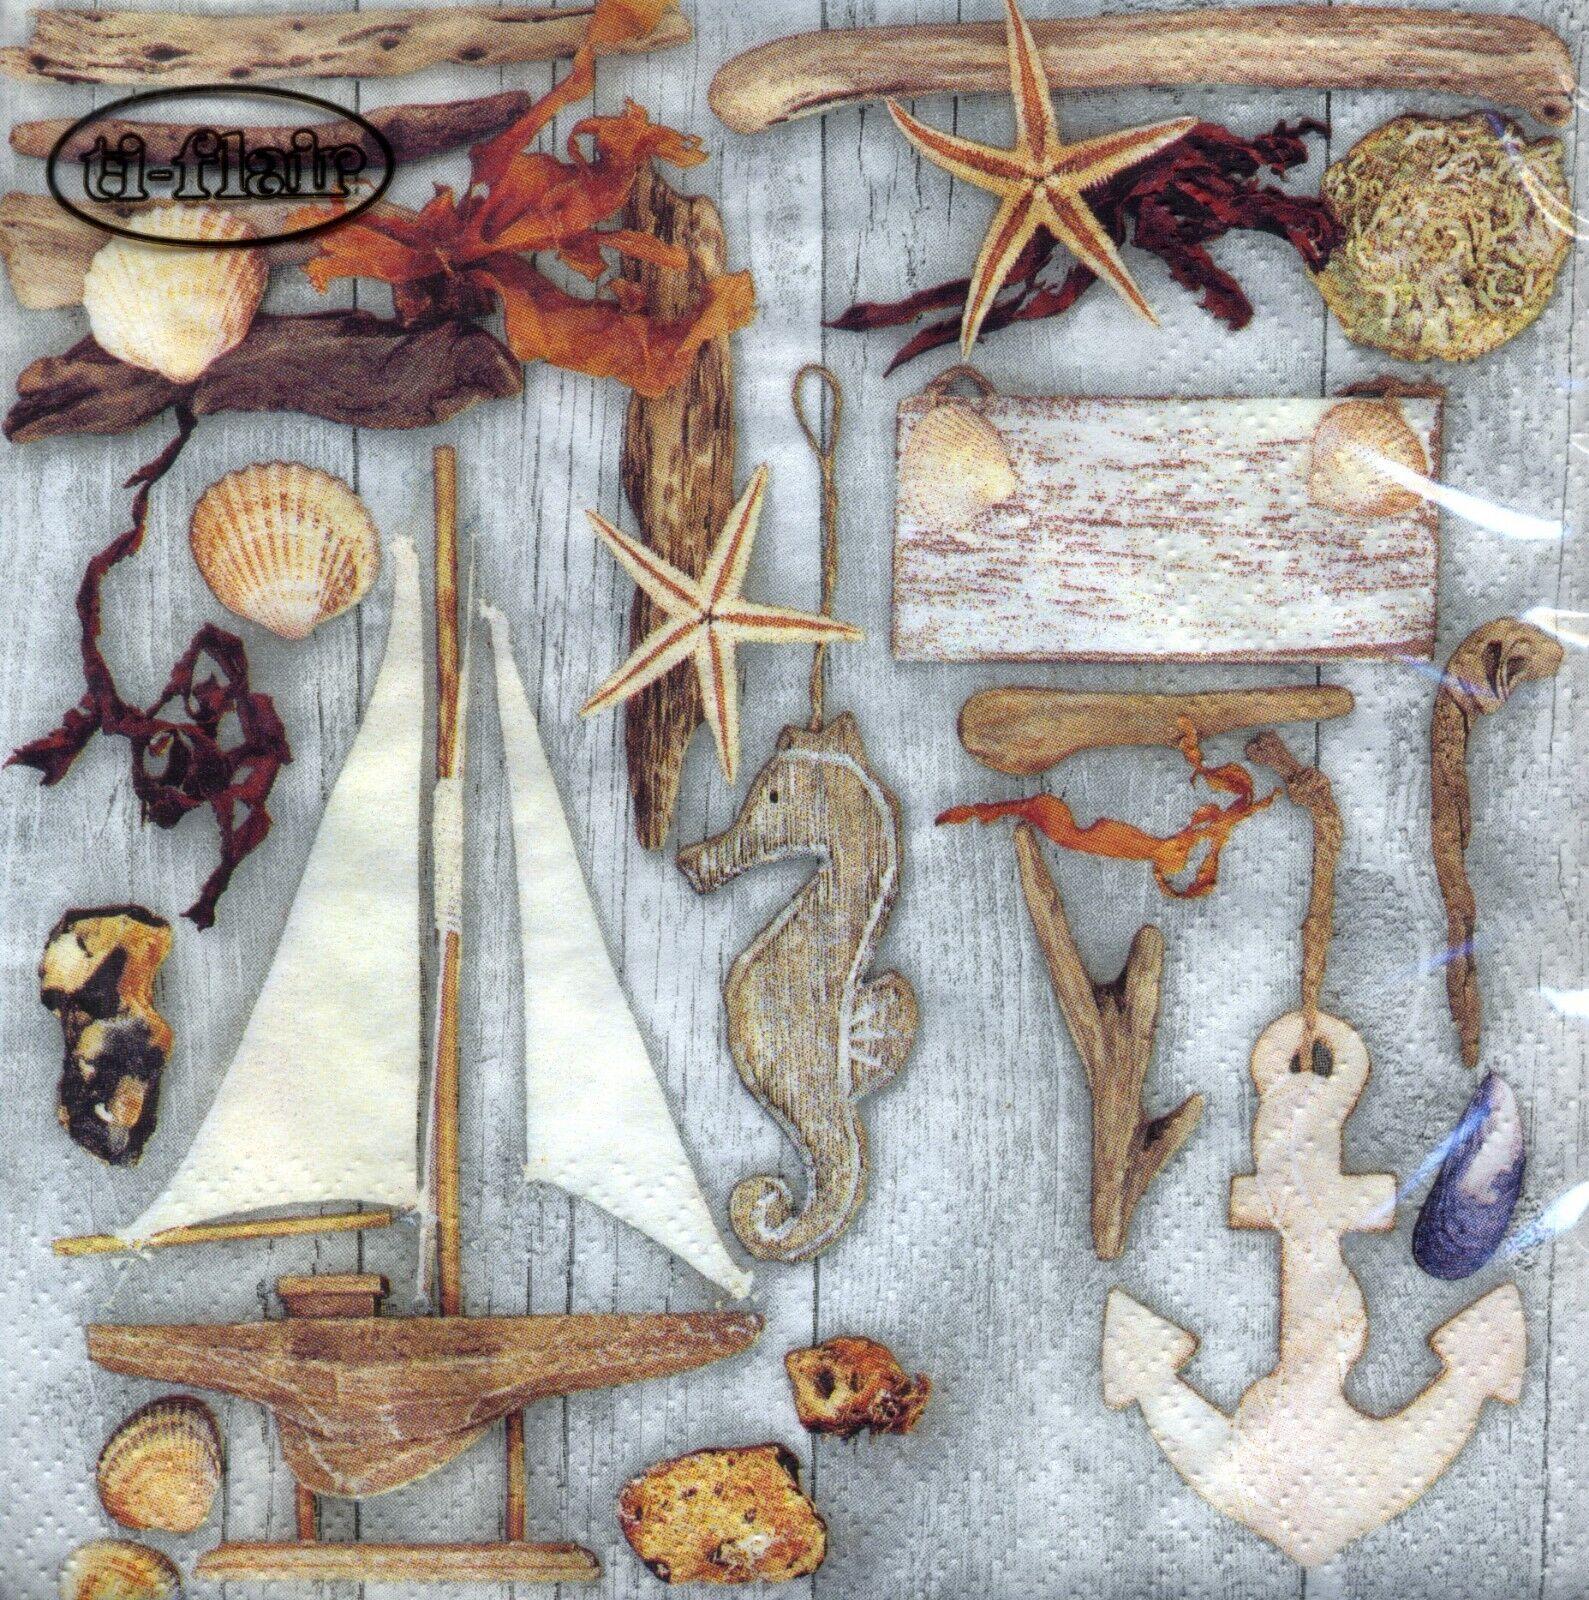 4 Lunch Paper Napkins Decoupage Craft Vintage Napkin Sea Driftwood For Sale Online Ebay